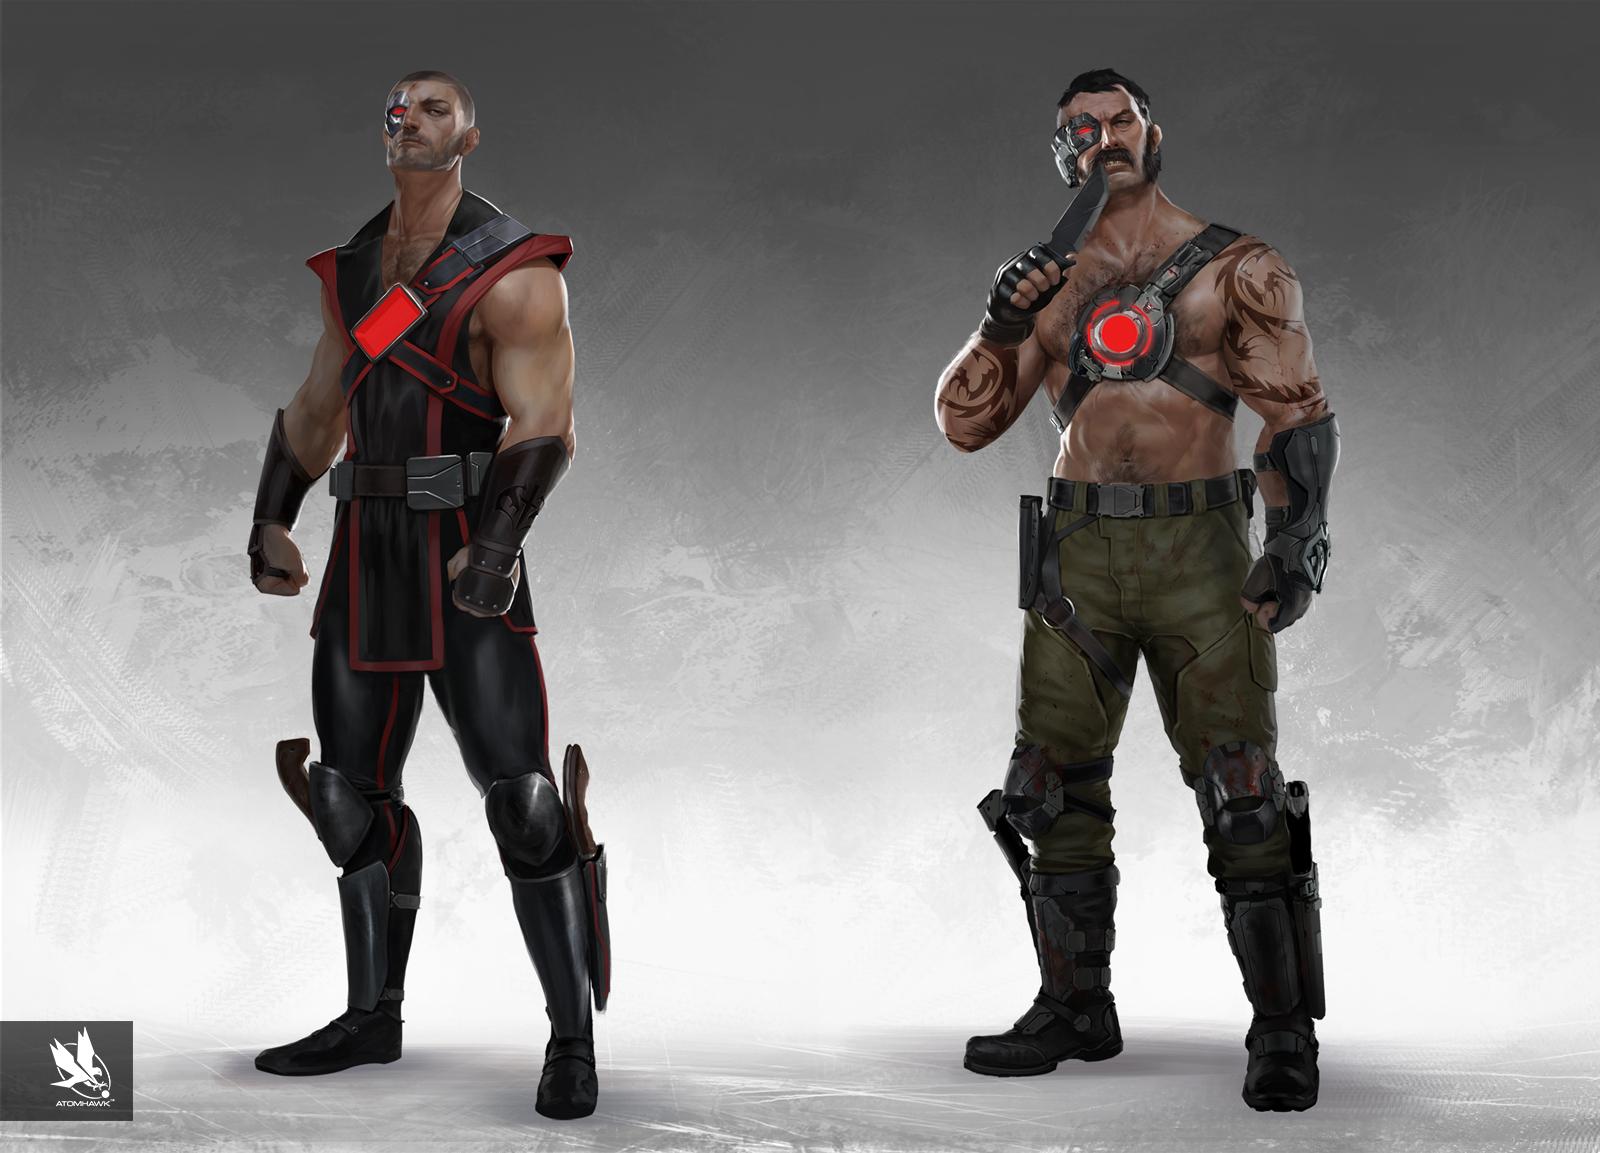 Atomhawk_Warner-Bros-NetherRealm_Mortal-Kombat-11_Concept-Art_Character-Design_Side-by-Side_Kano.jpg